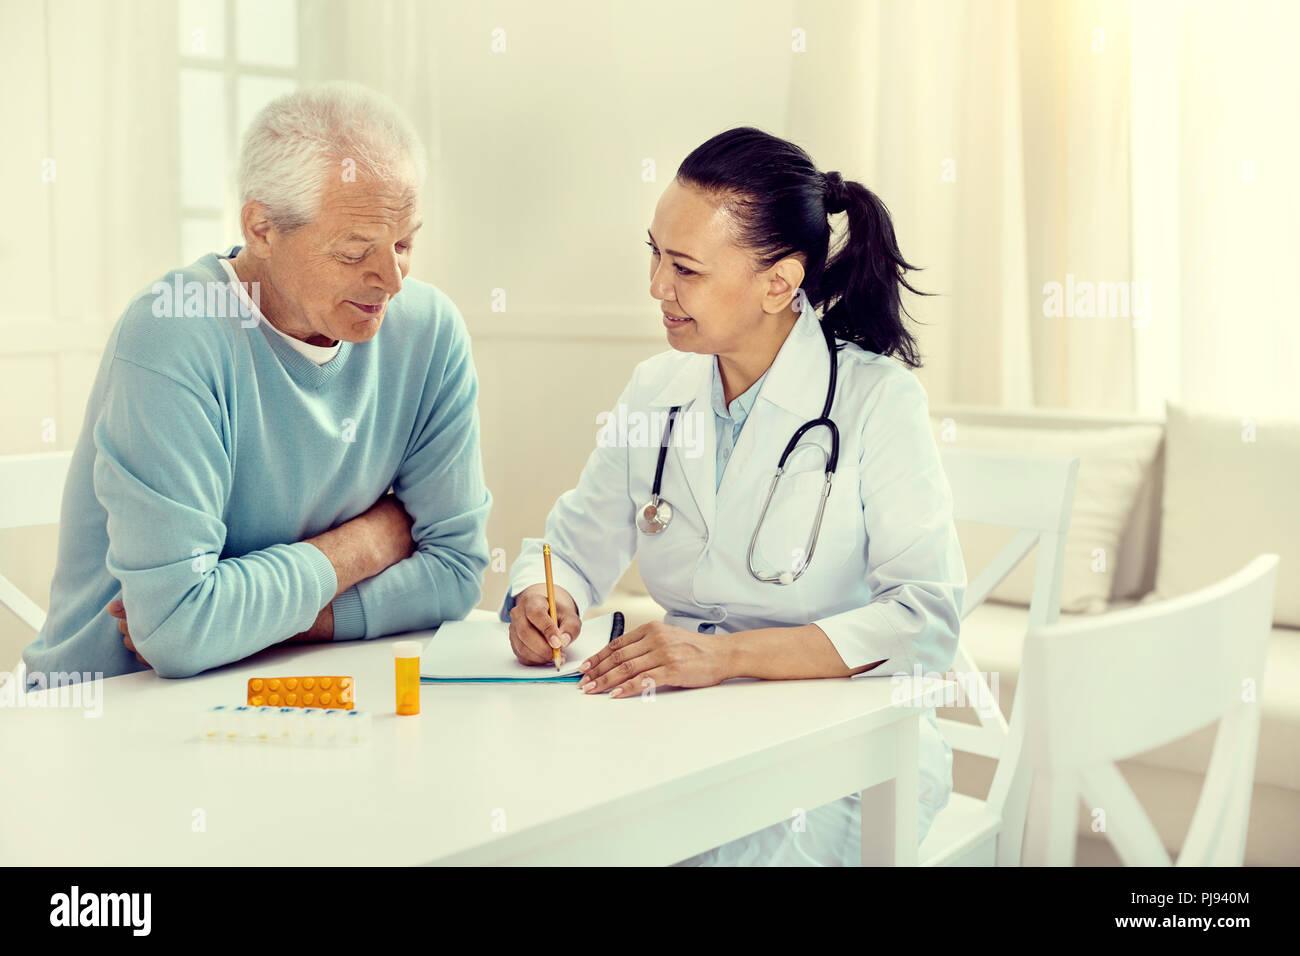 Cheerful doctor and retired gentleman discussing regimen - Stock Image